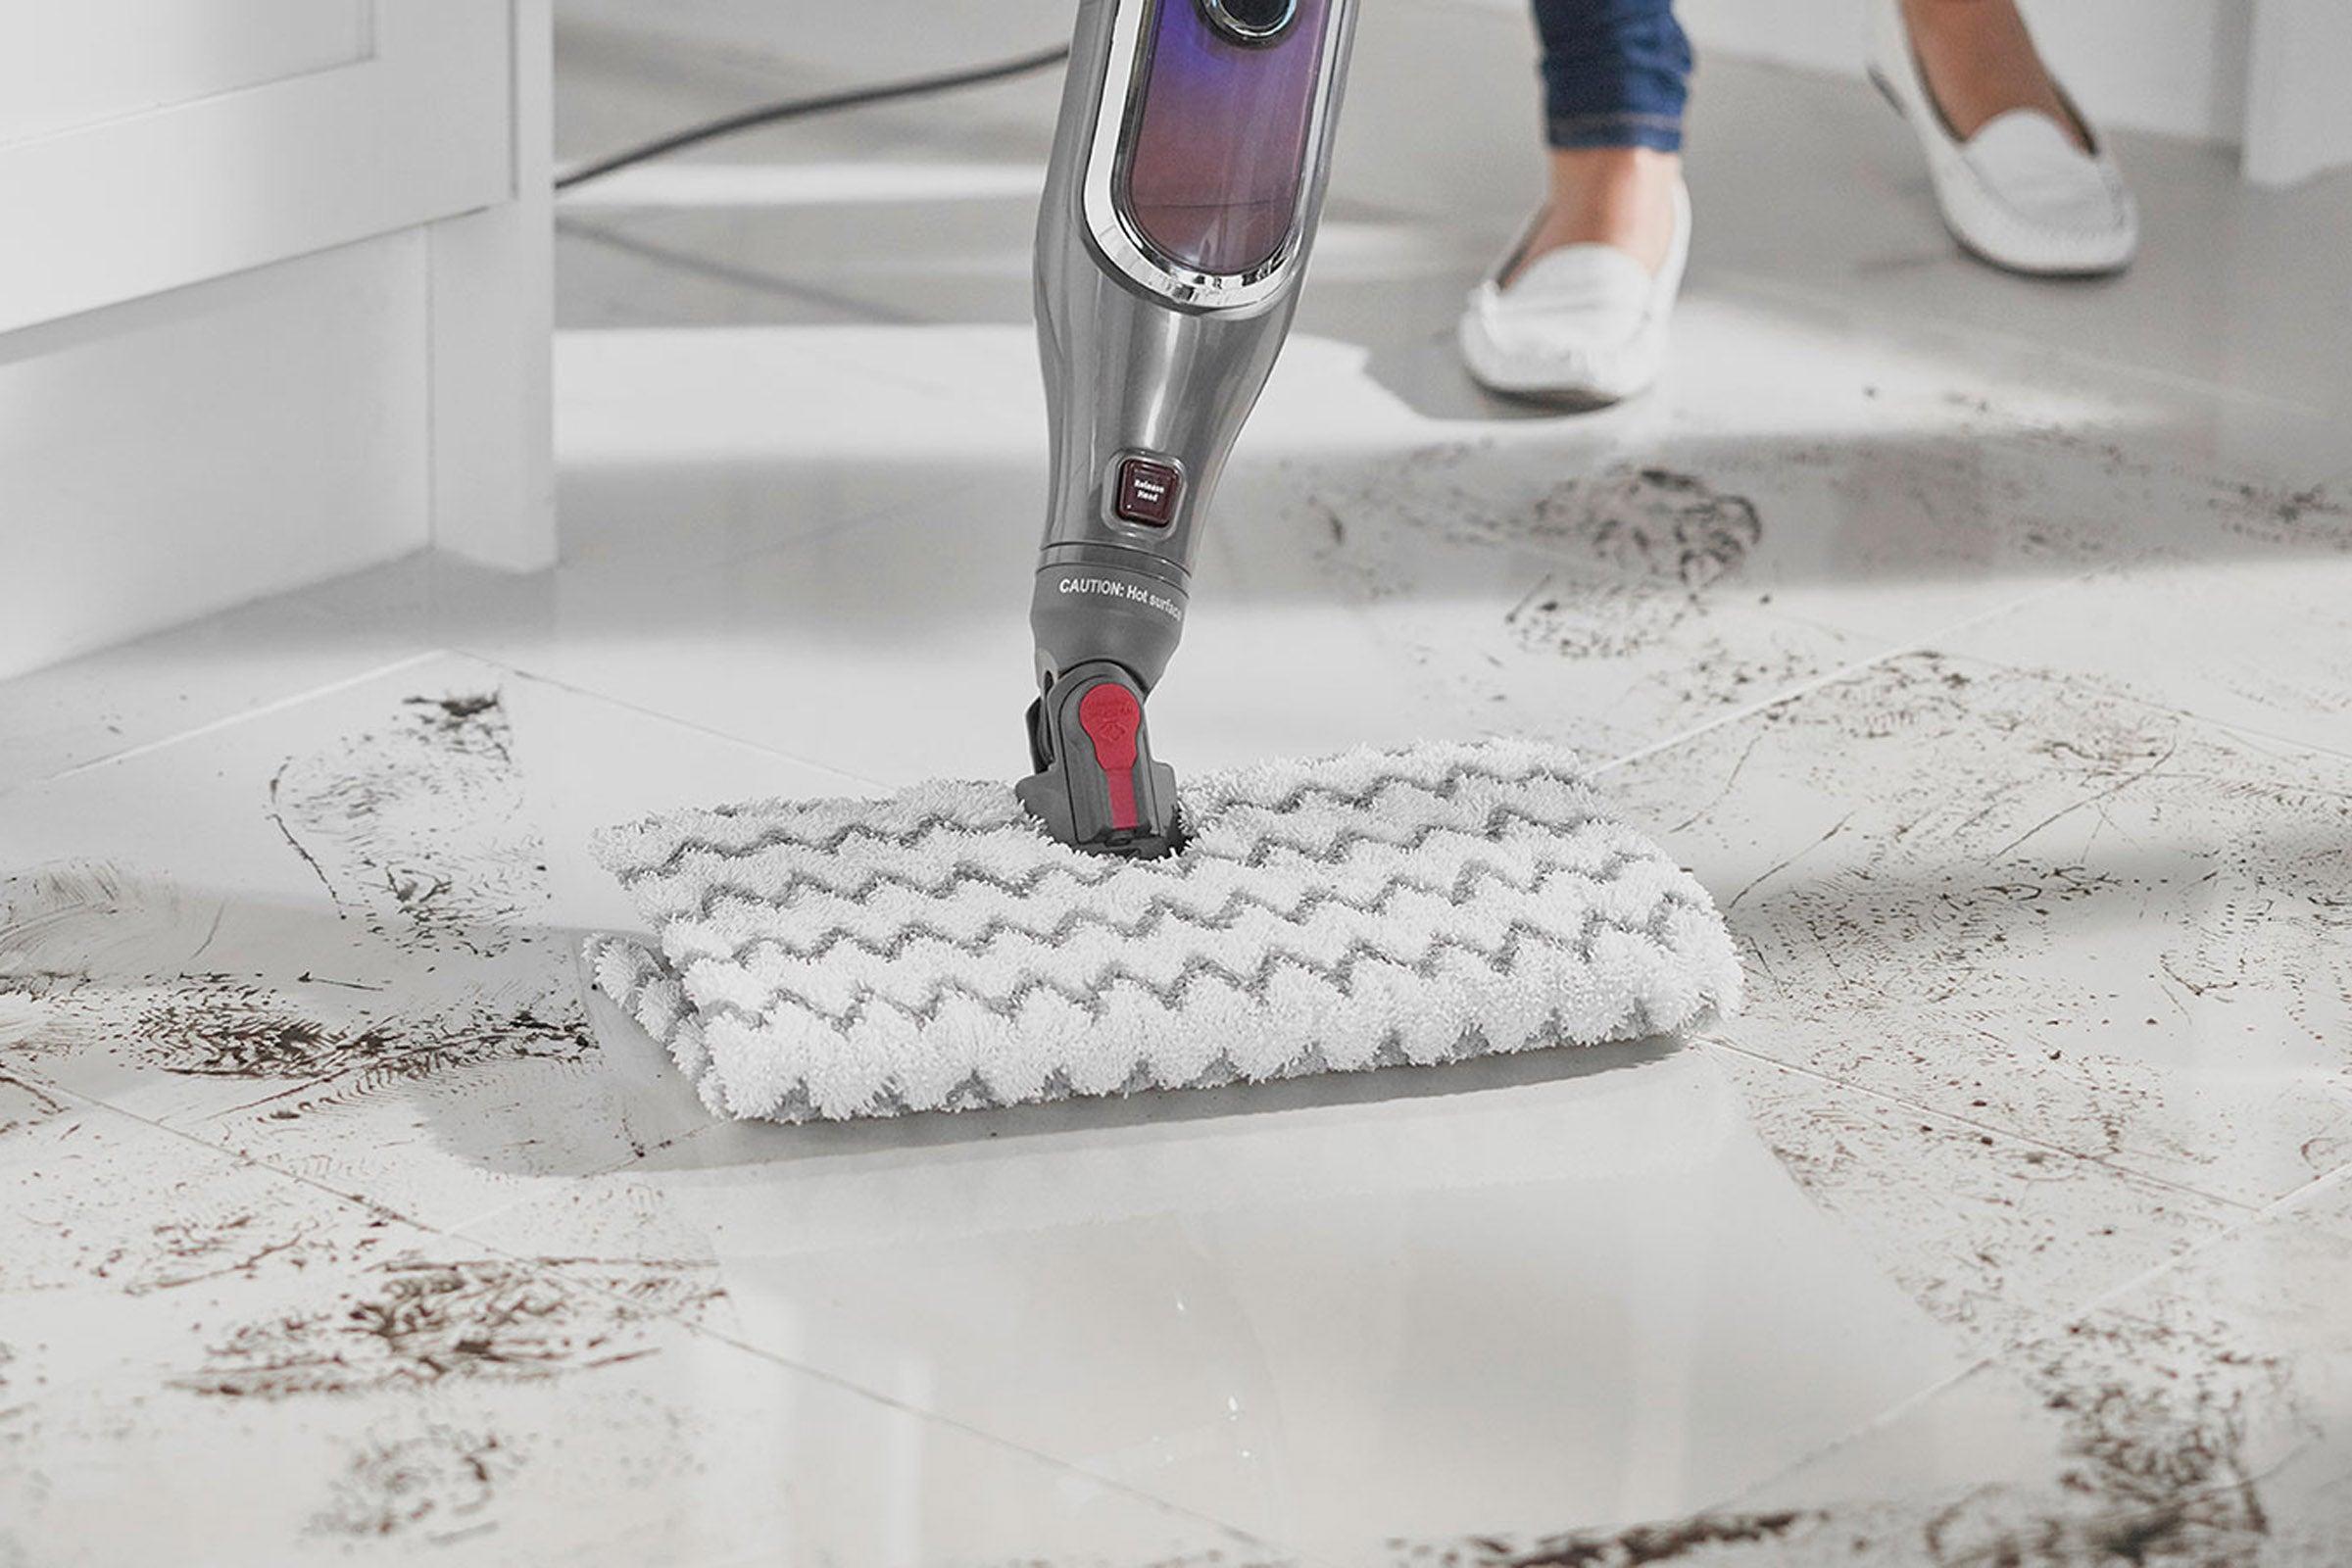 Best Steam Cleaners 2019 The Best For Carpet Tiles Floors